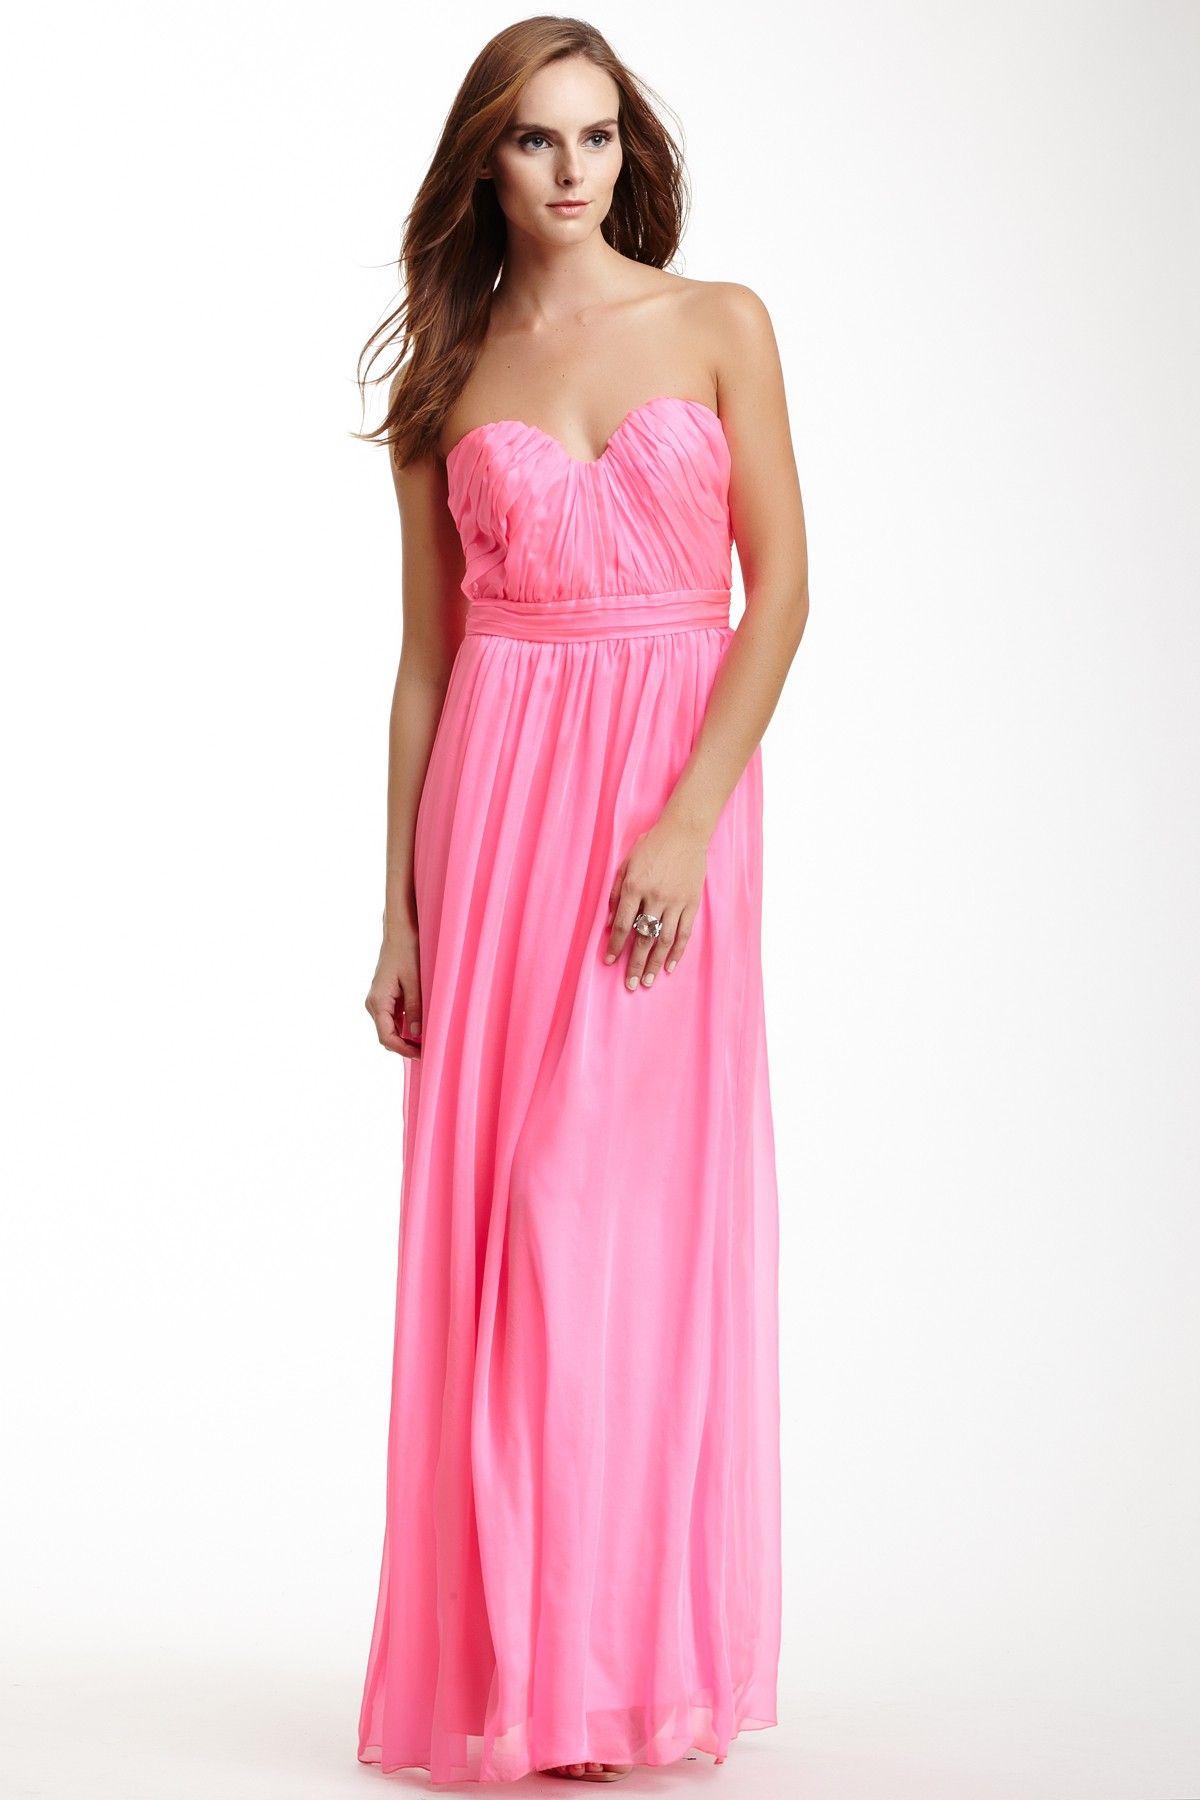 strapless shirred bodice gown | Mi ropa! | Pinterest | Damas, Tela y ...